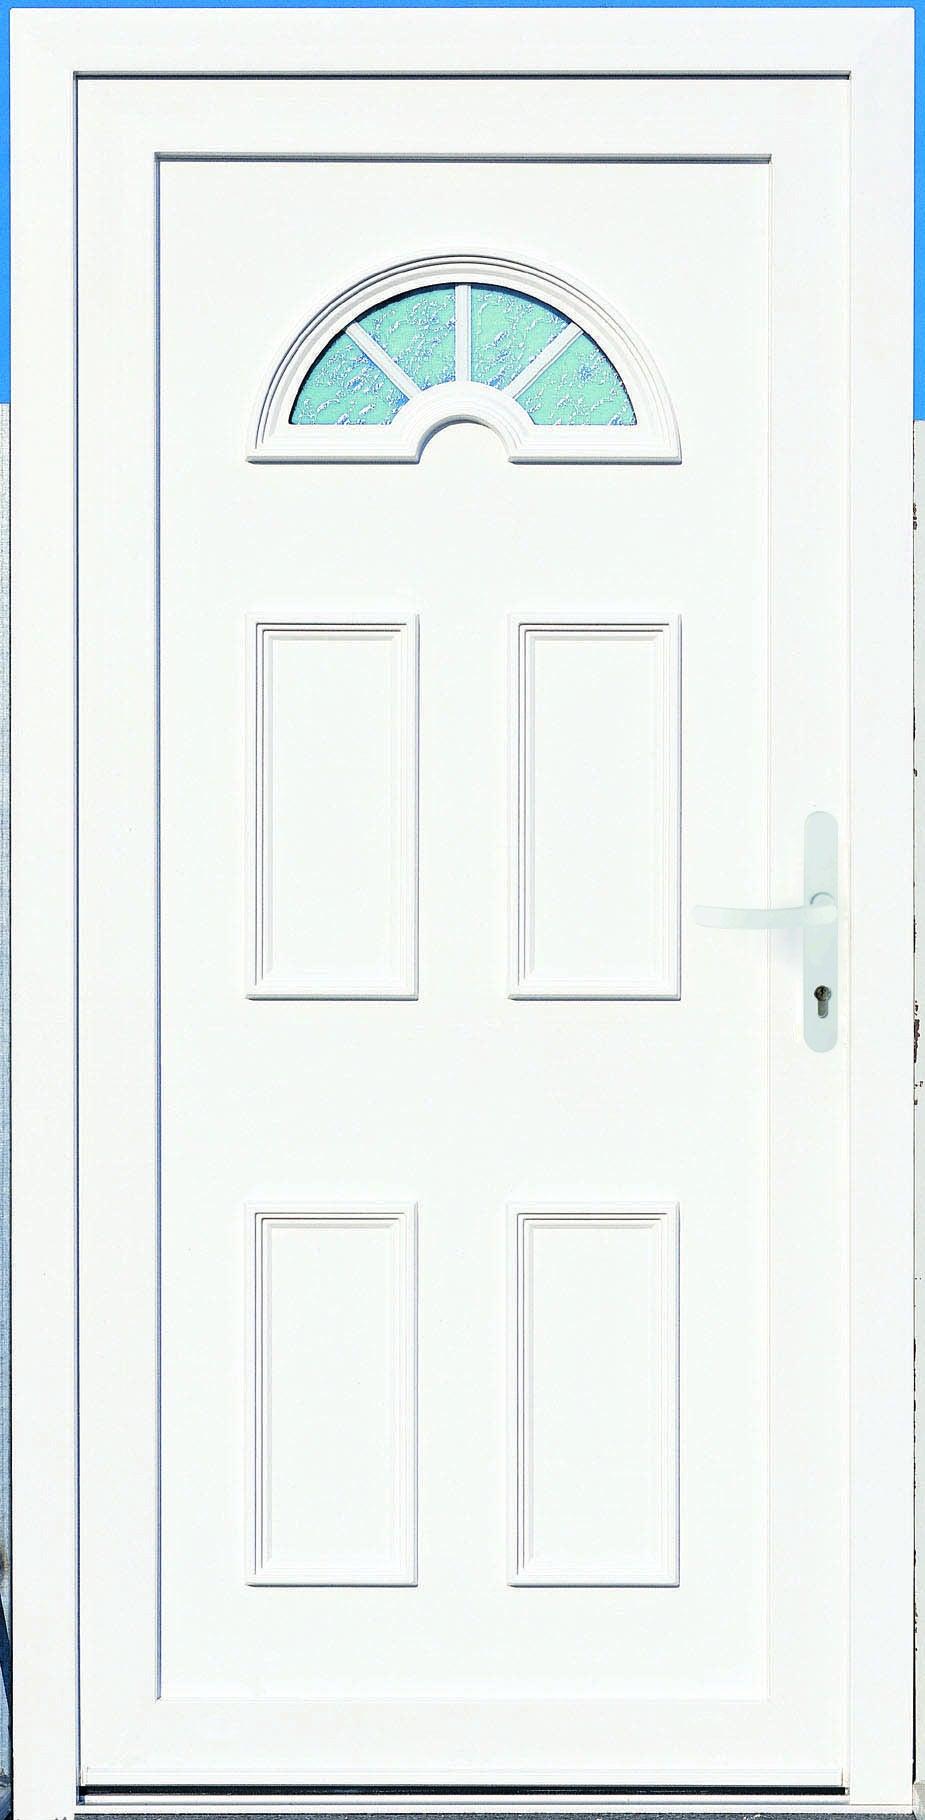 porte d entree pvc elegance 2 primo h 215 x l 90 cm vitree blanc poussant droit